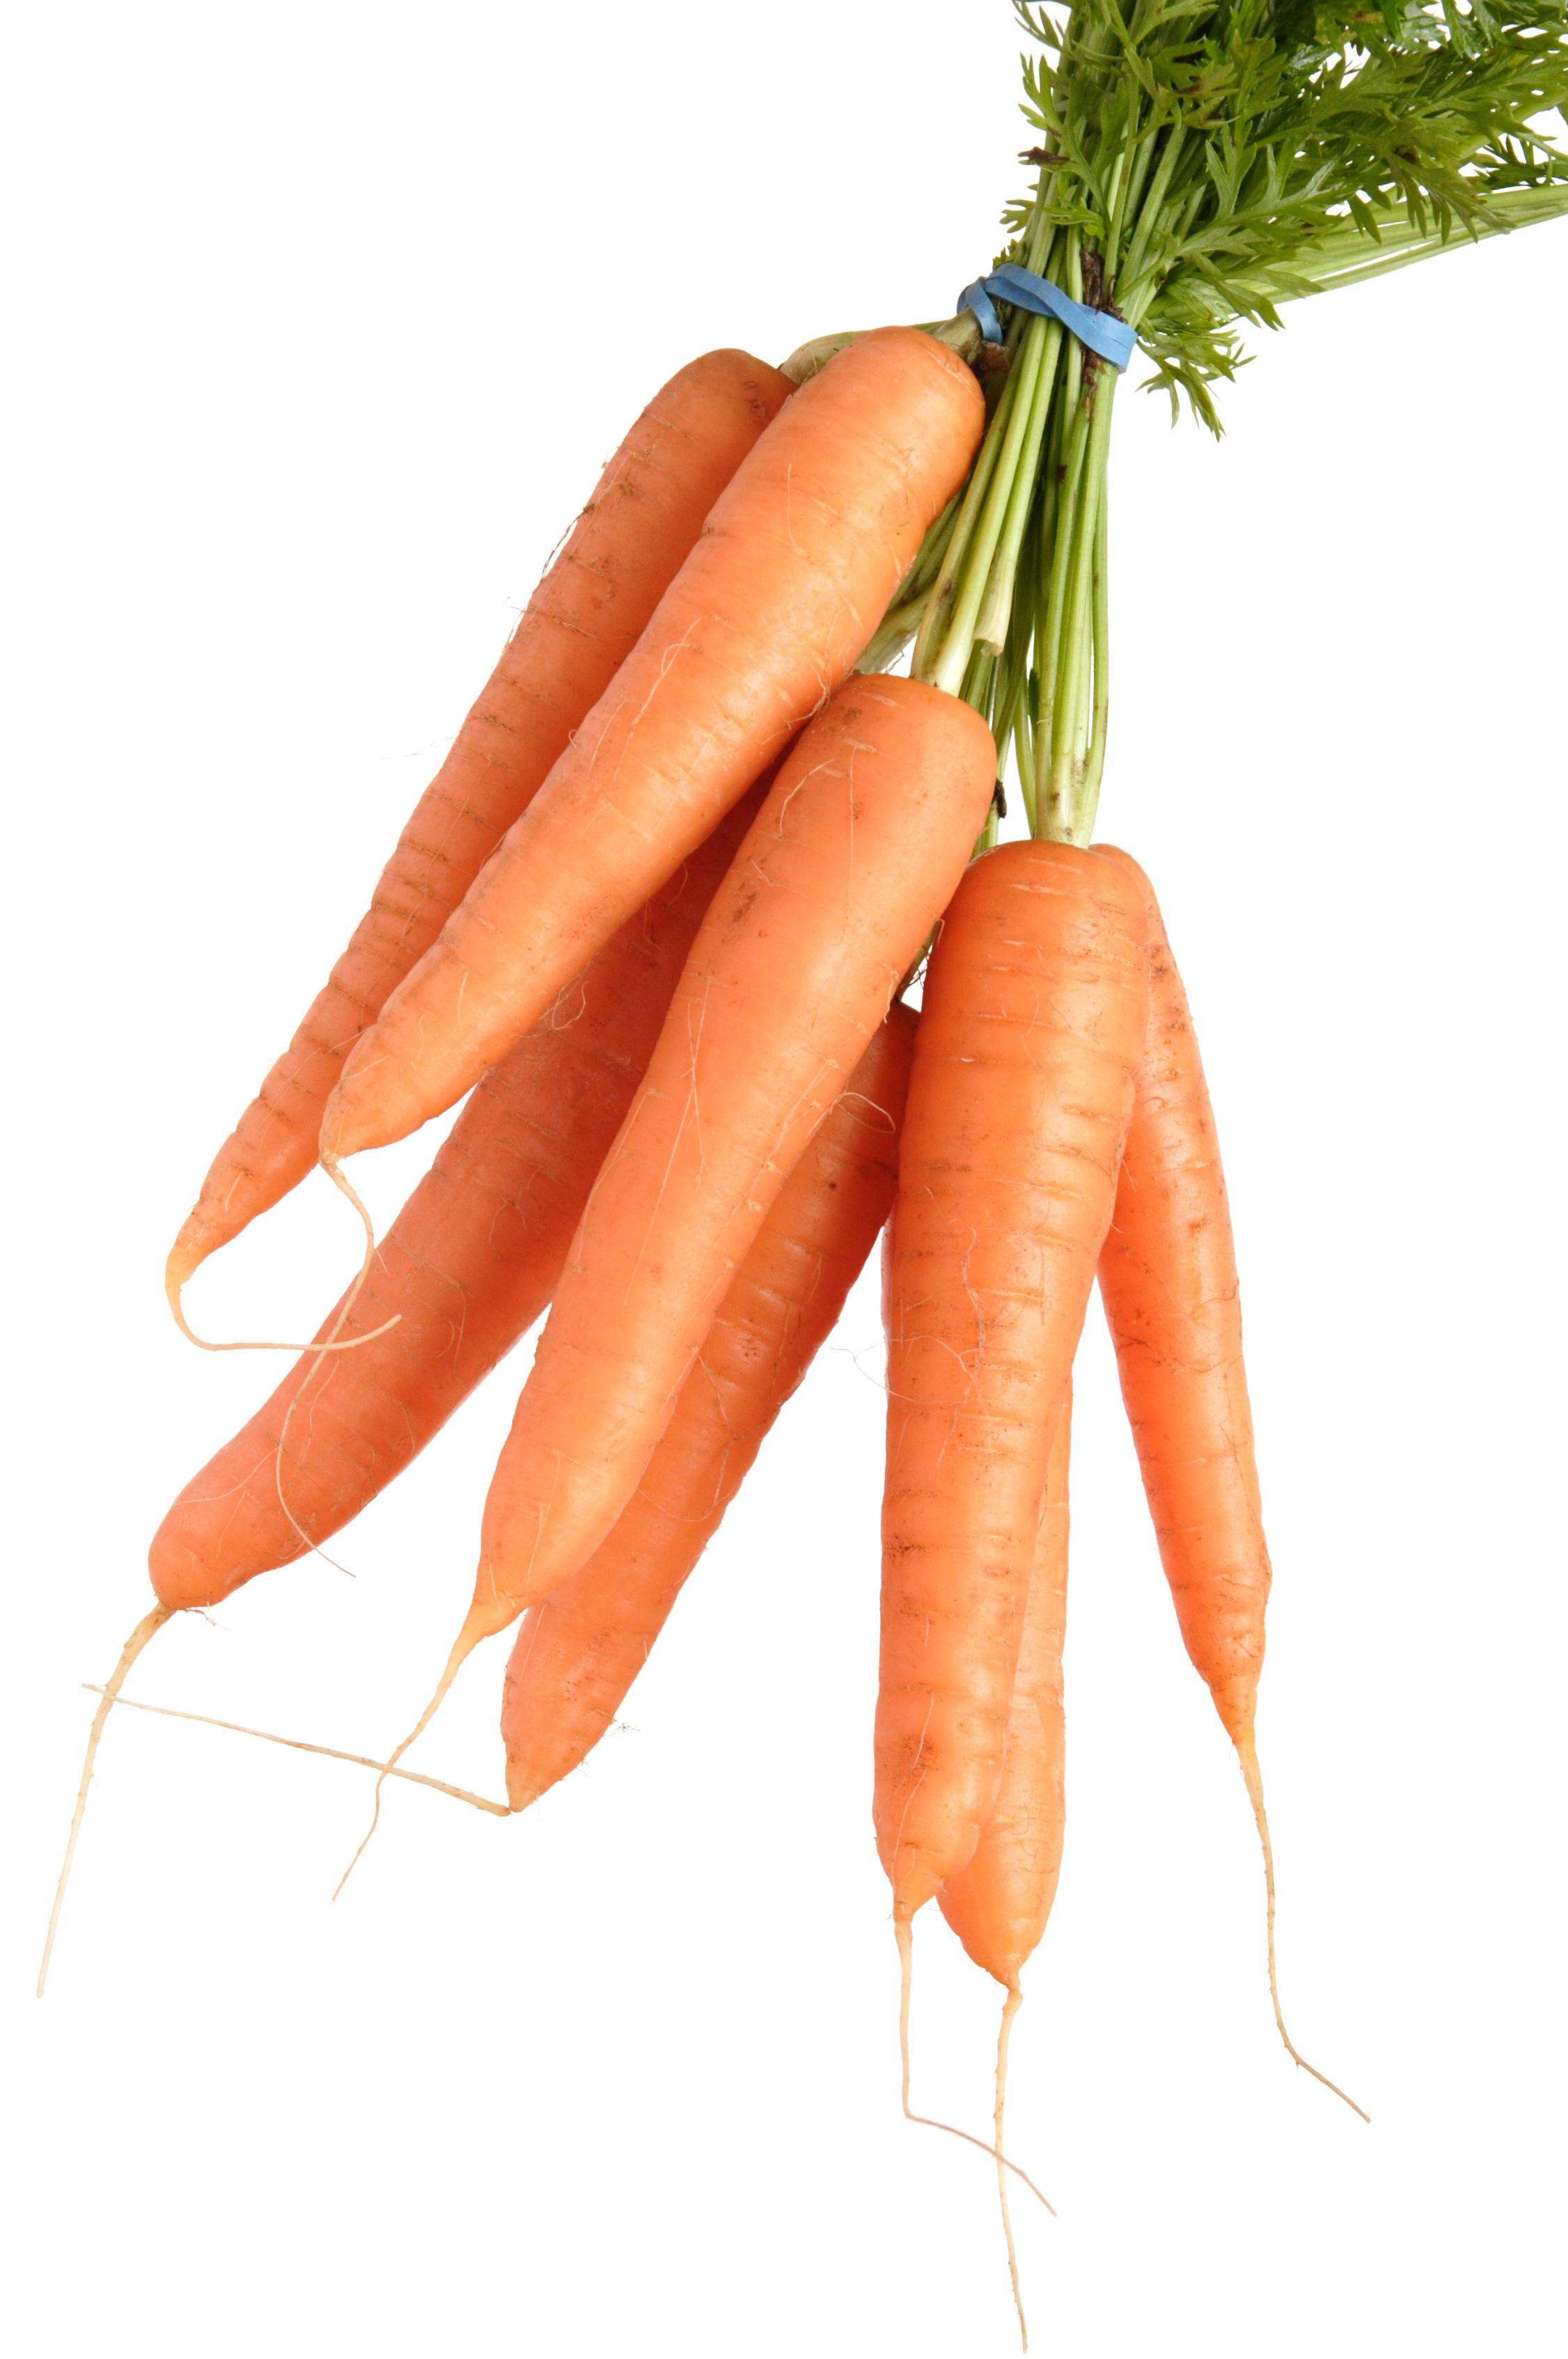 Coloriage carotte gratuit imprimer - Dessin de carotte ...